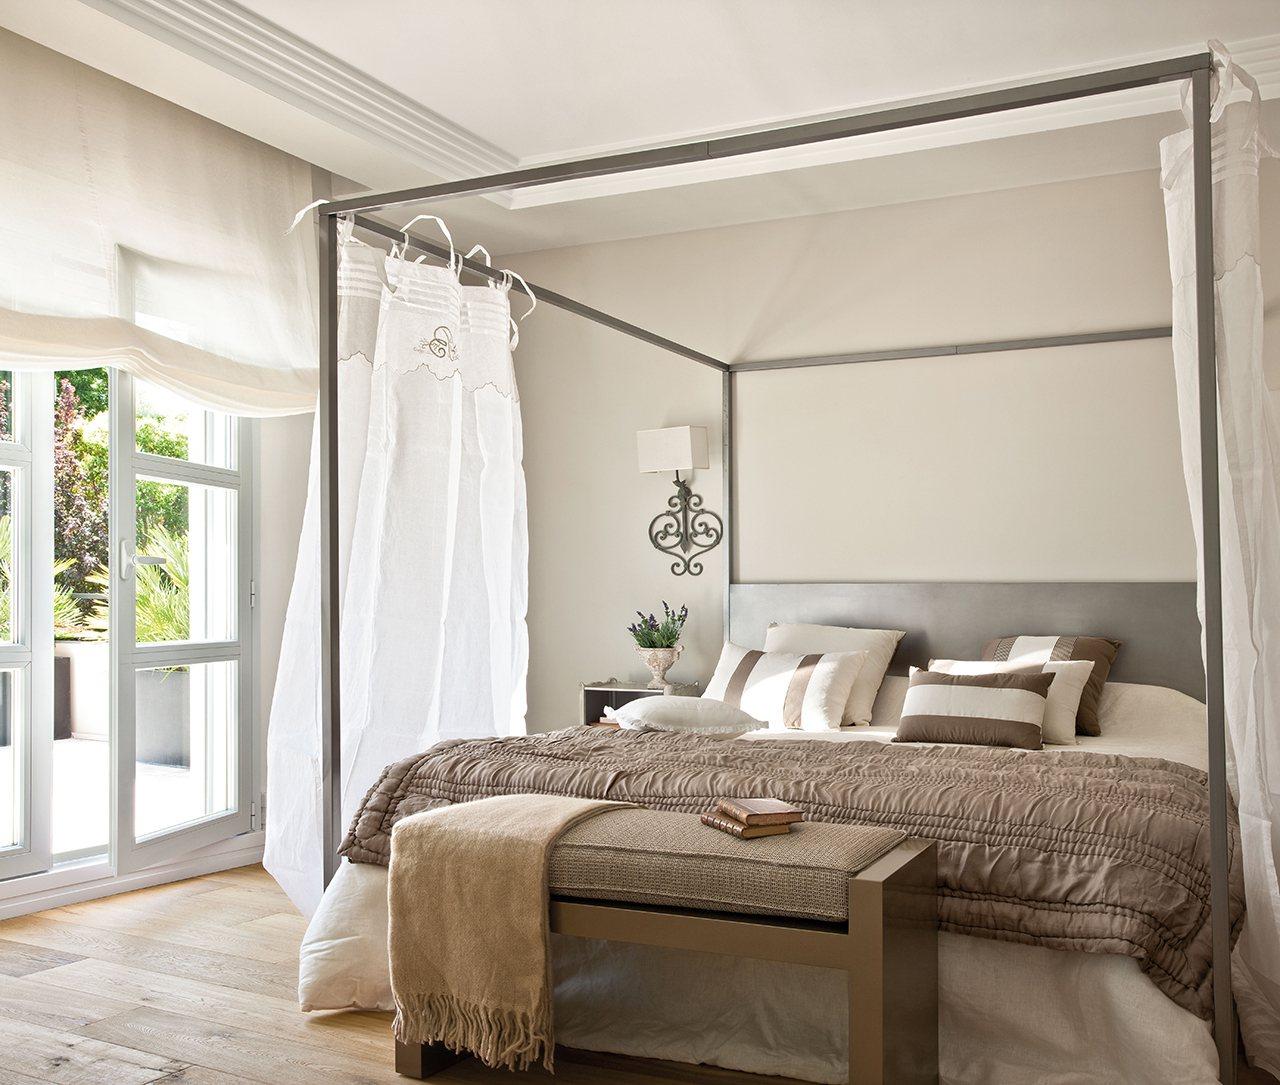 10 camas con dosel decoraci n retro - Cama con dosel ...